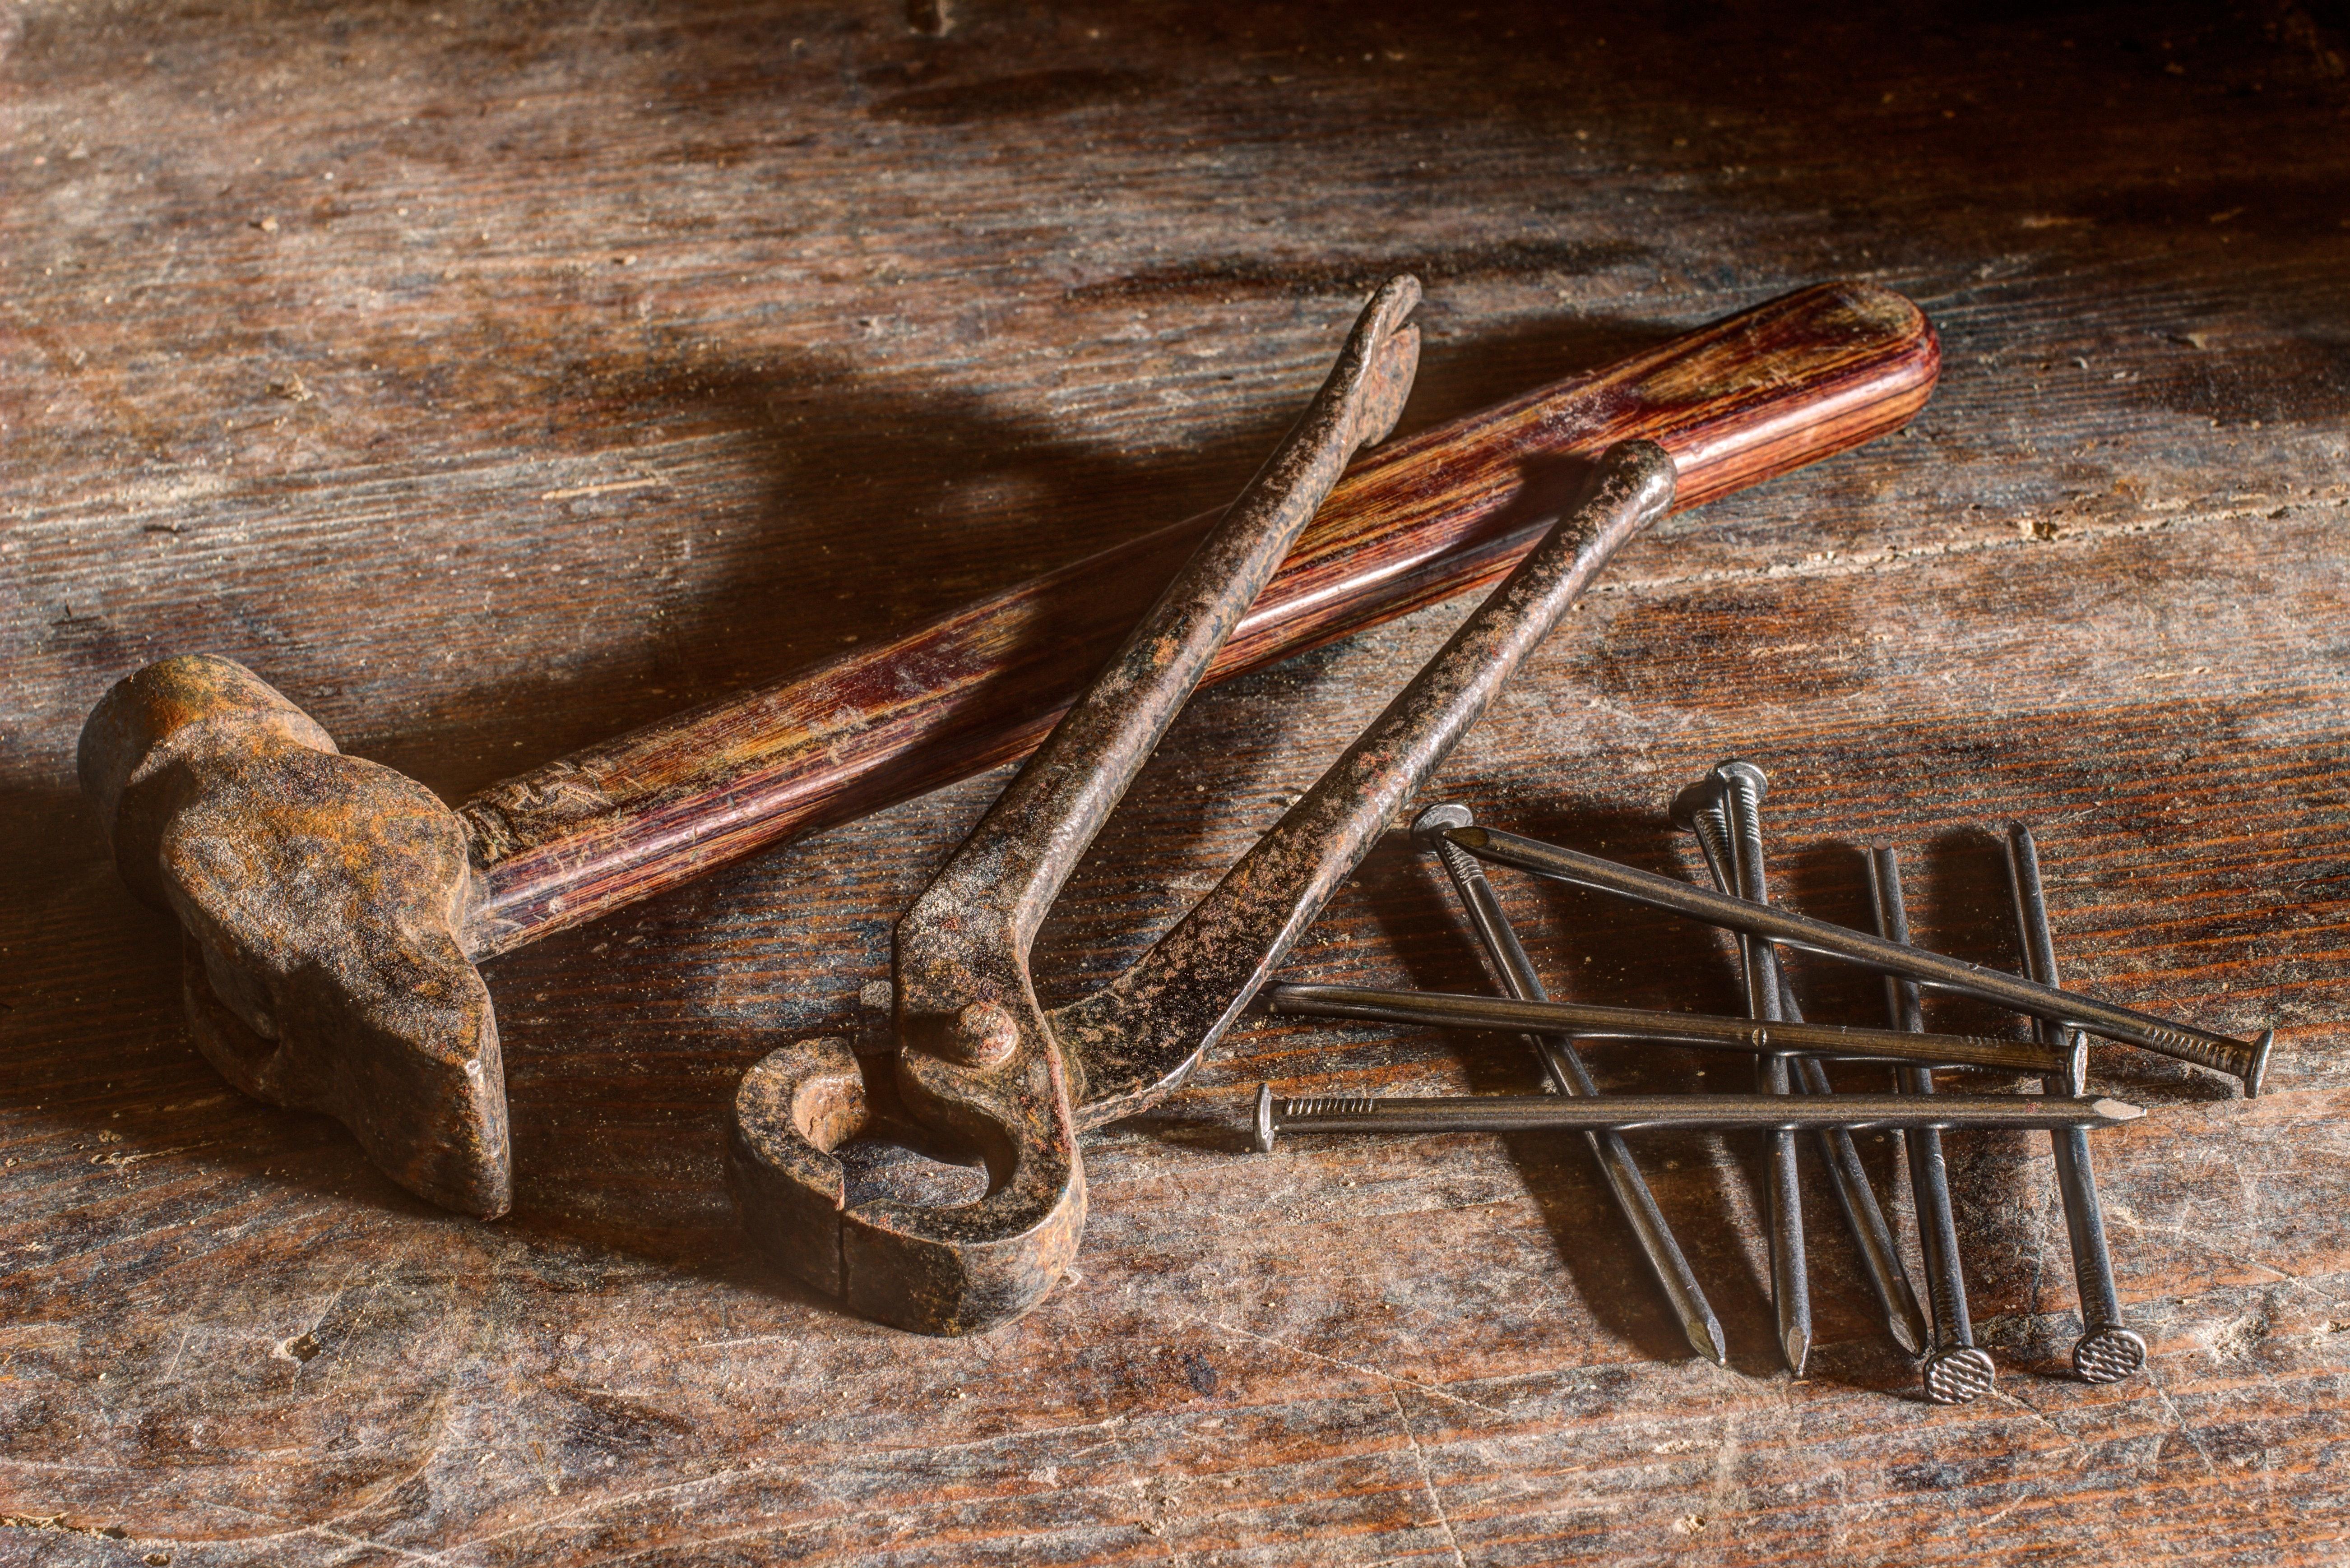 Brown Hammer Near Silver Nail, Hammer, Nails, Old, Rust, HQ Photo